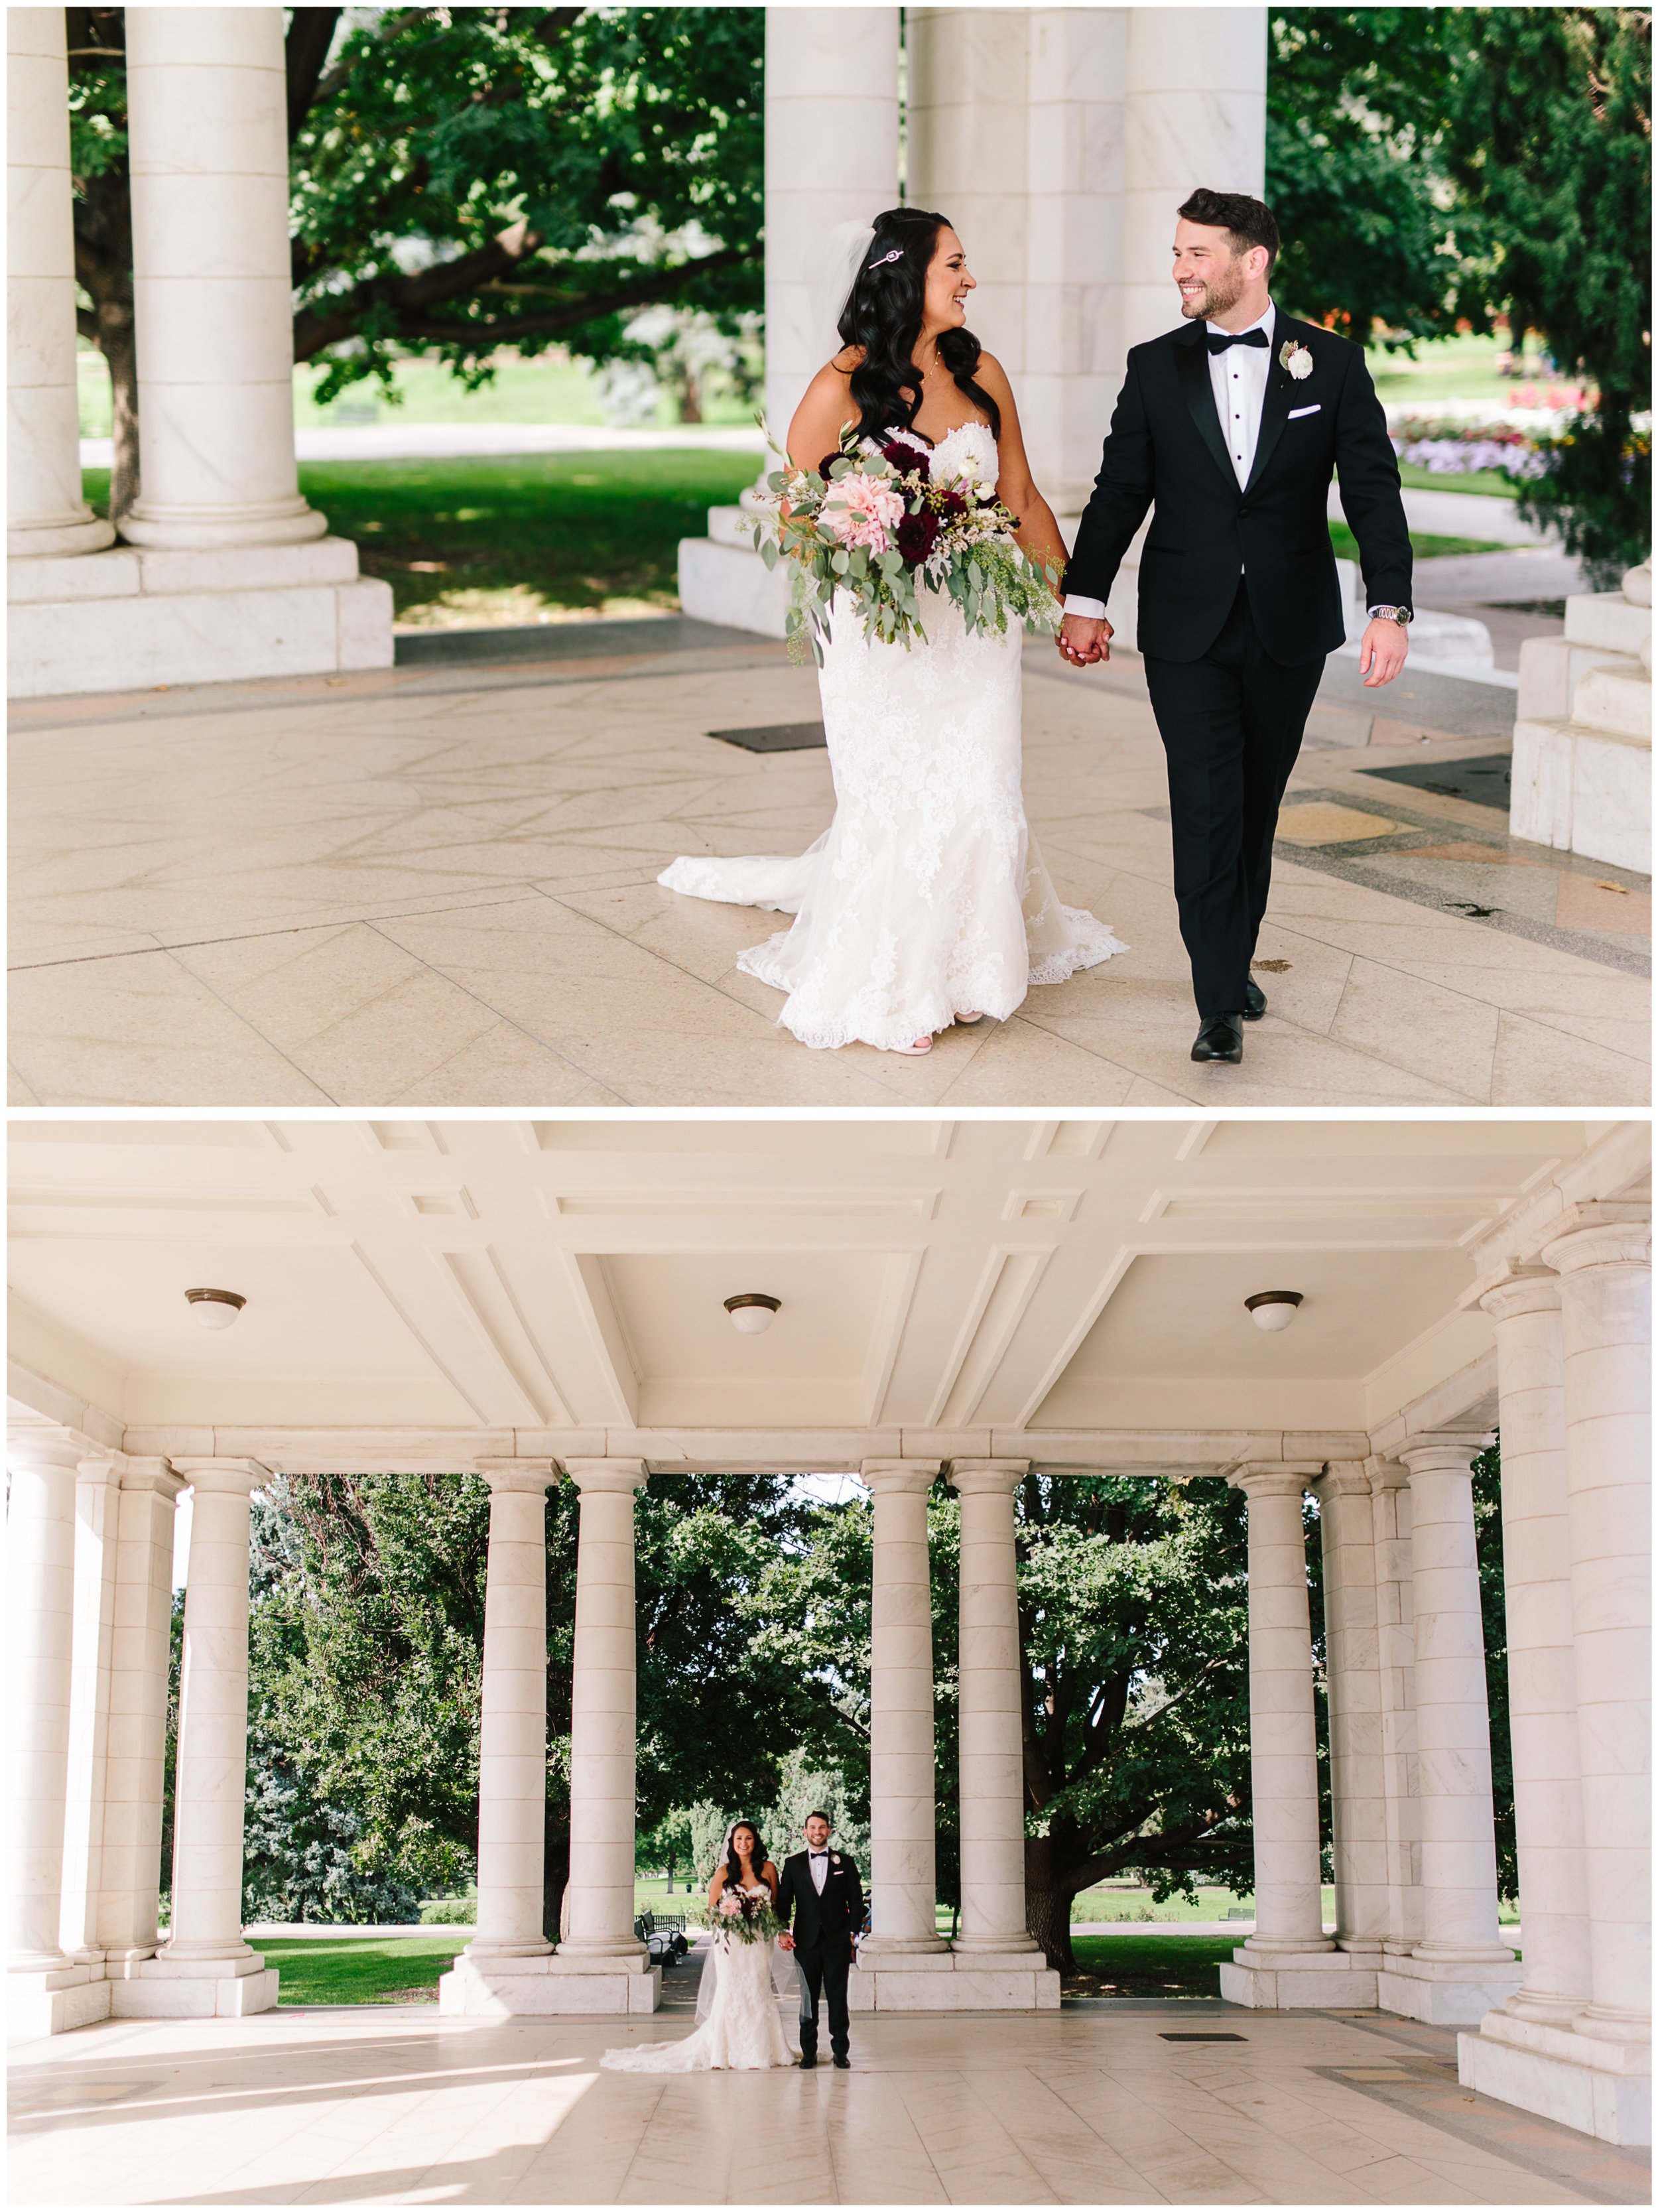 moss_denver_wedding_33.jpg